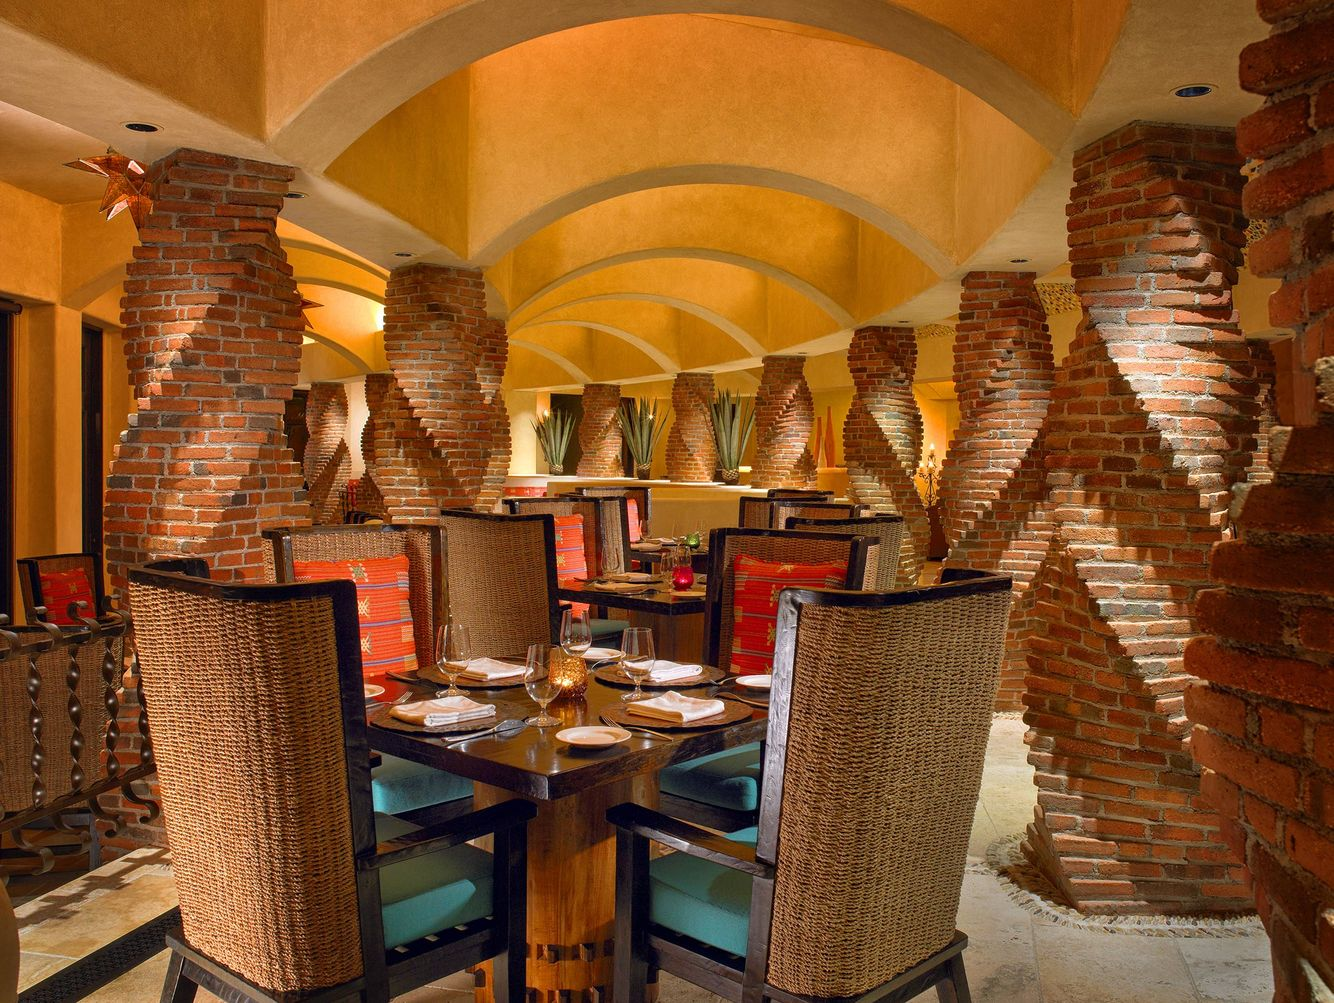 John-Sutton-Photography-ElDorado Restaurant